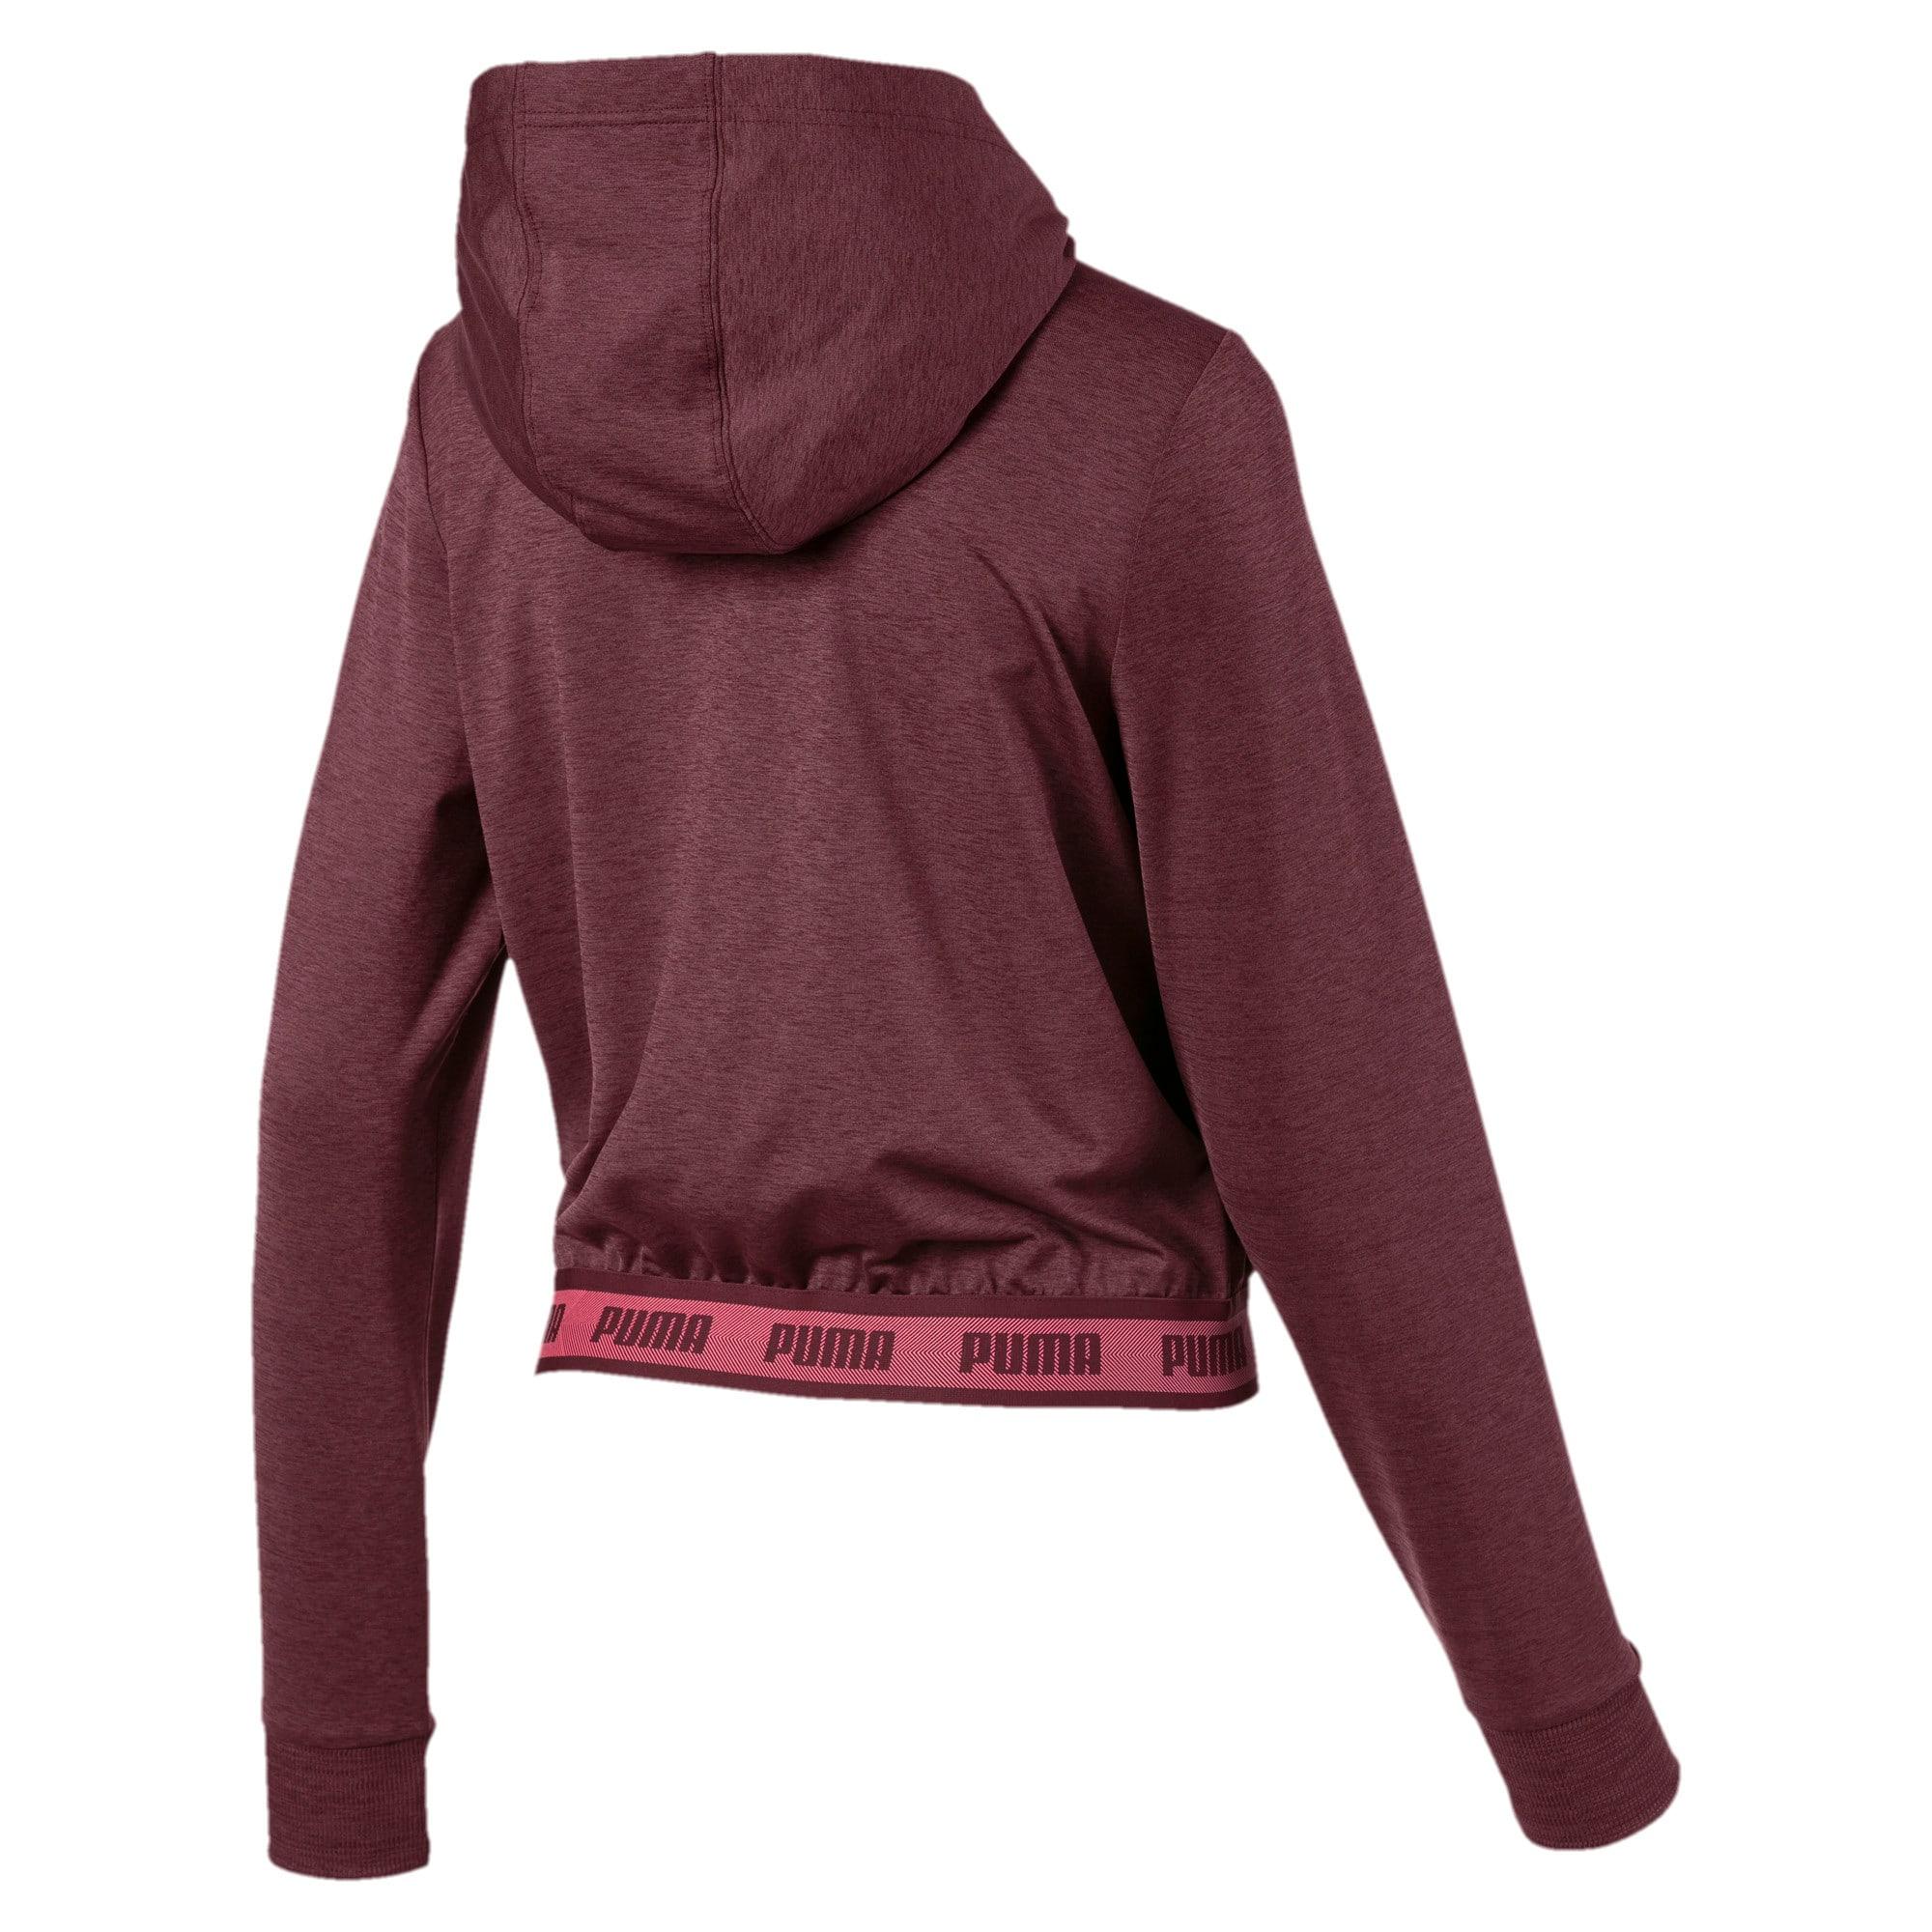 Thumbnail 5 of SOFT SPORTS Hooded Women's Sweat Jacket, Vineyard Wine Heather, medium-IND